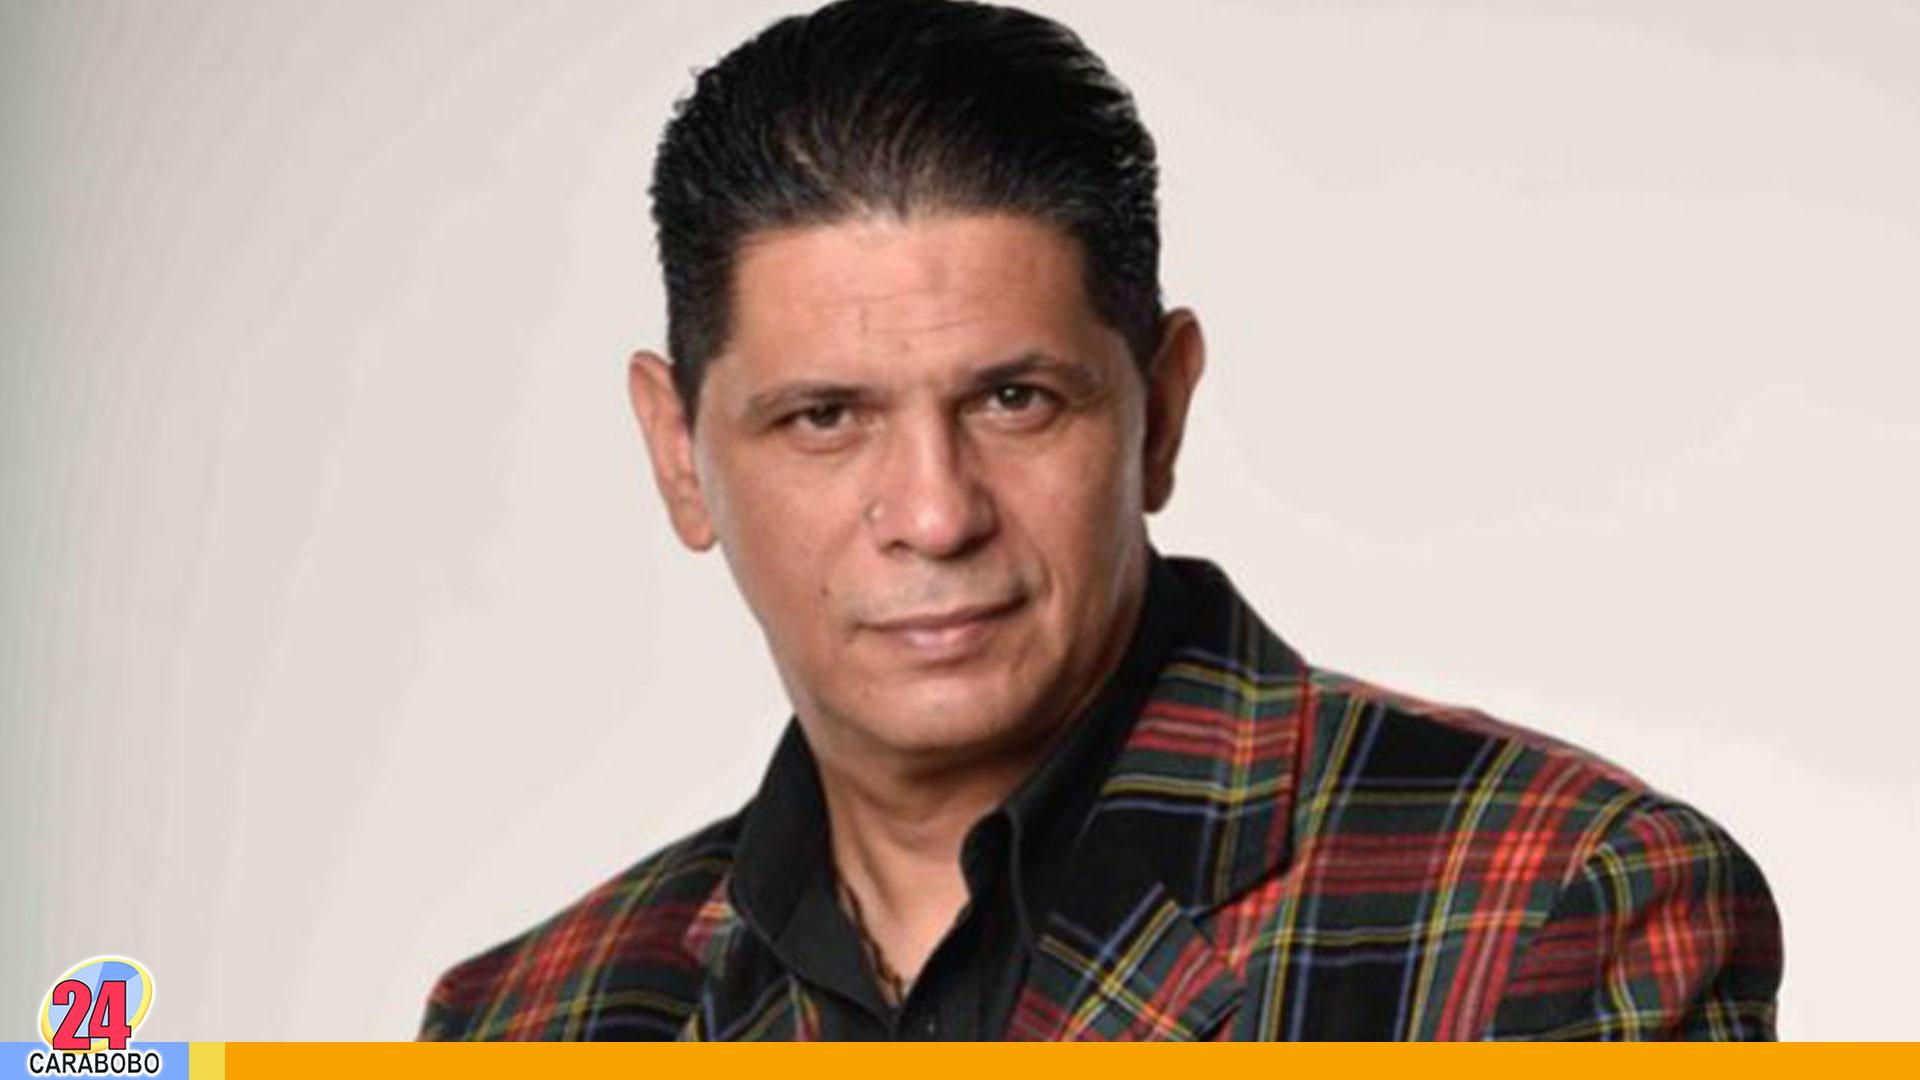 Carlos Cruz - Carlos Cruz